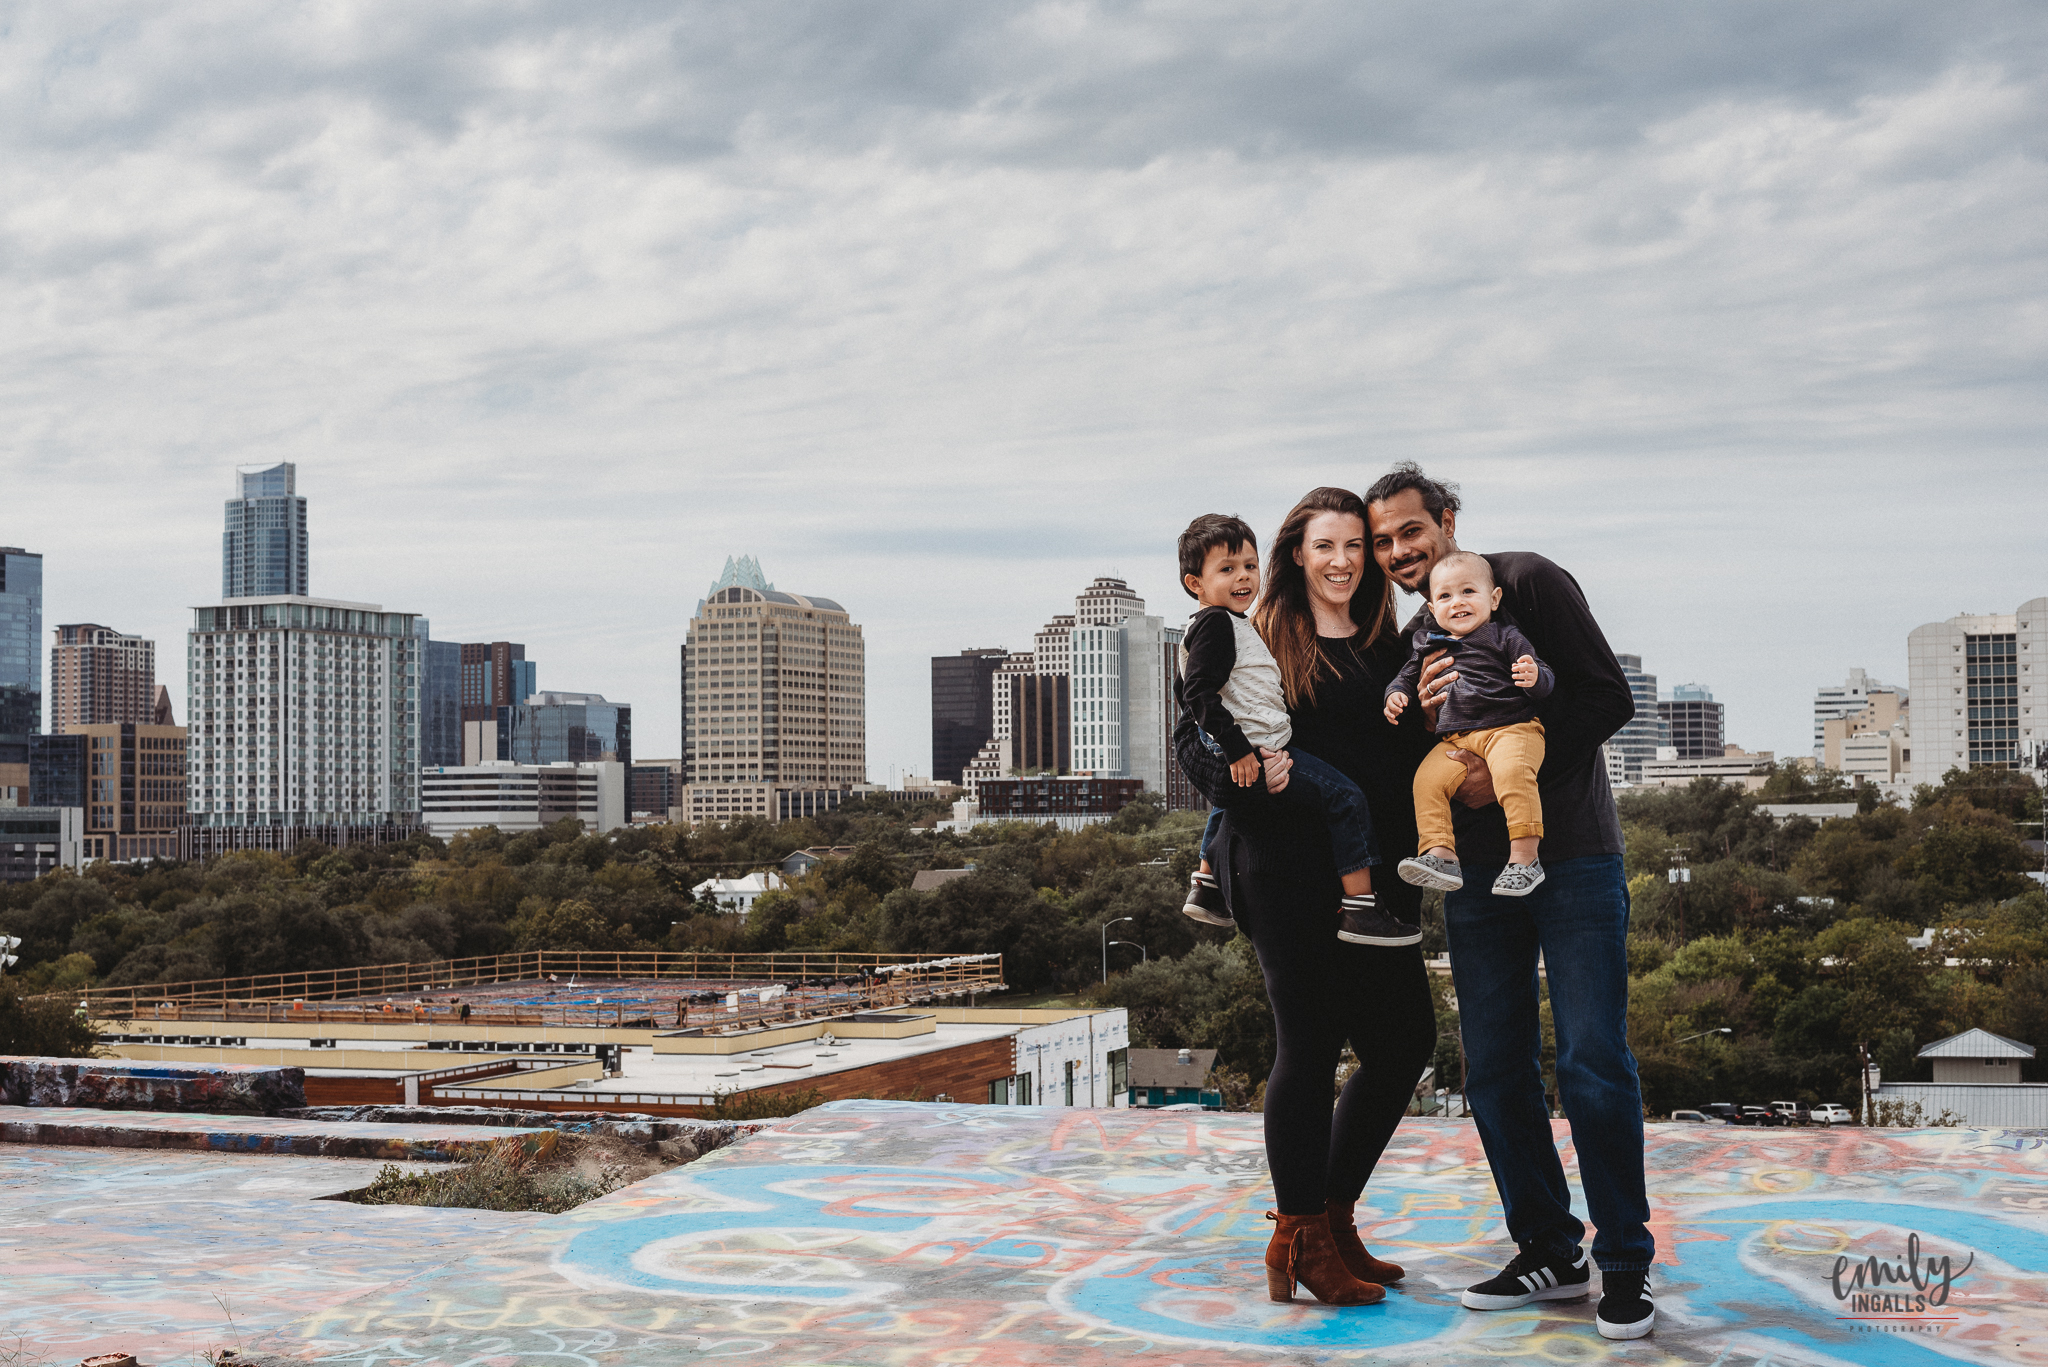 Family Photographer_Round Rock Photographer_Emily Ingalls Photography_Austin Photographer_Pflugerville Photographer_Georgetown Photographer_Graffiti Hill at Castle Park, Austin-9.jpg